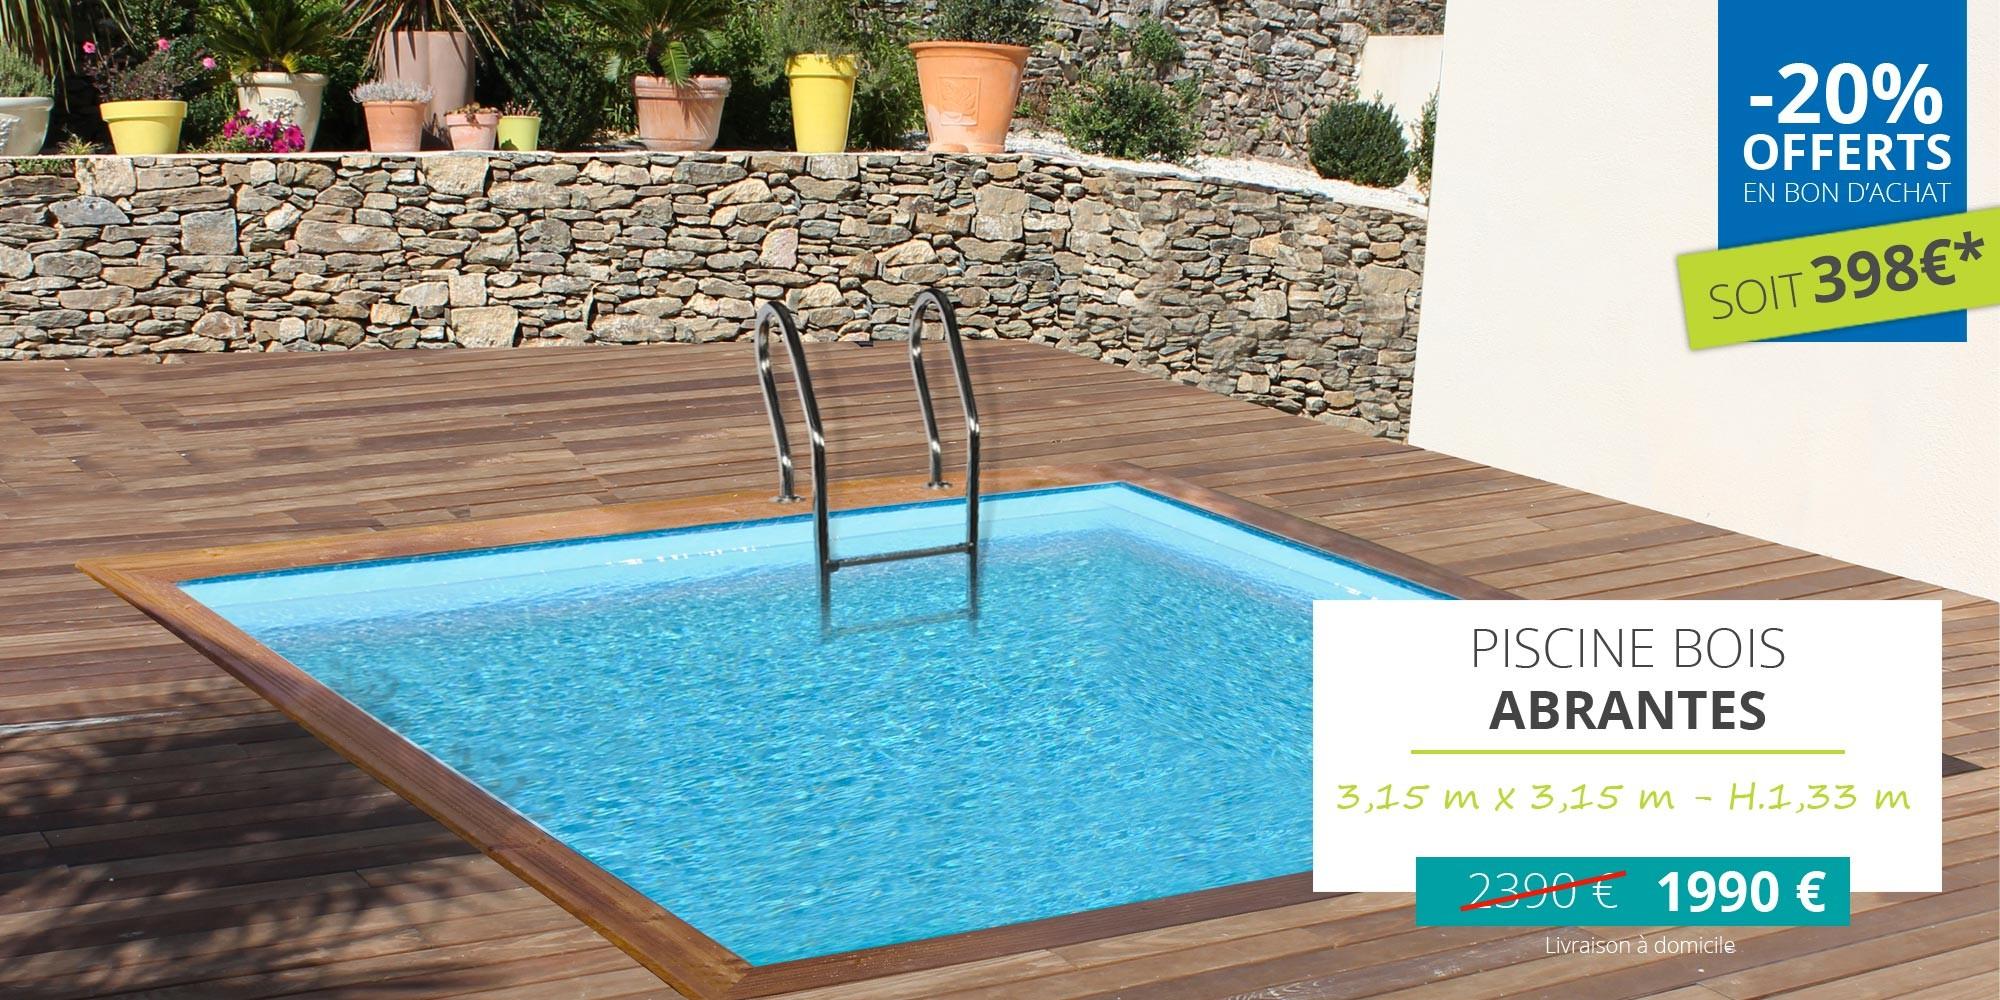 Promotion piscine bois abrantes, piscine sunbay carré